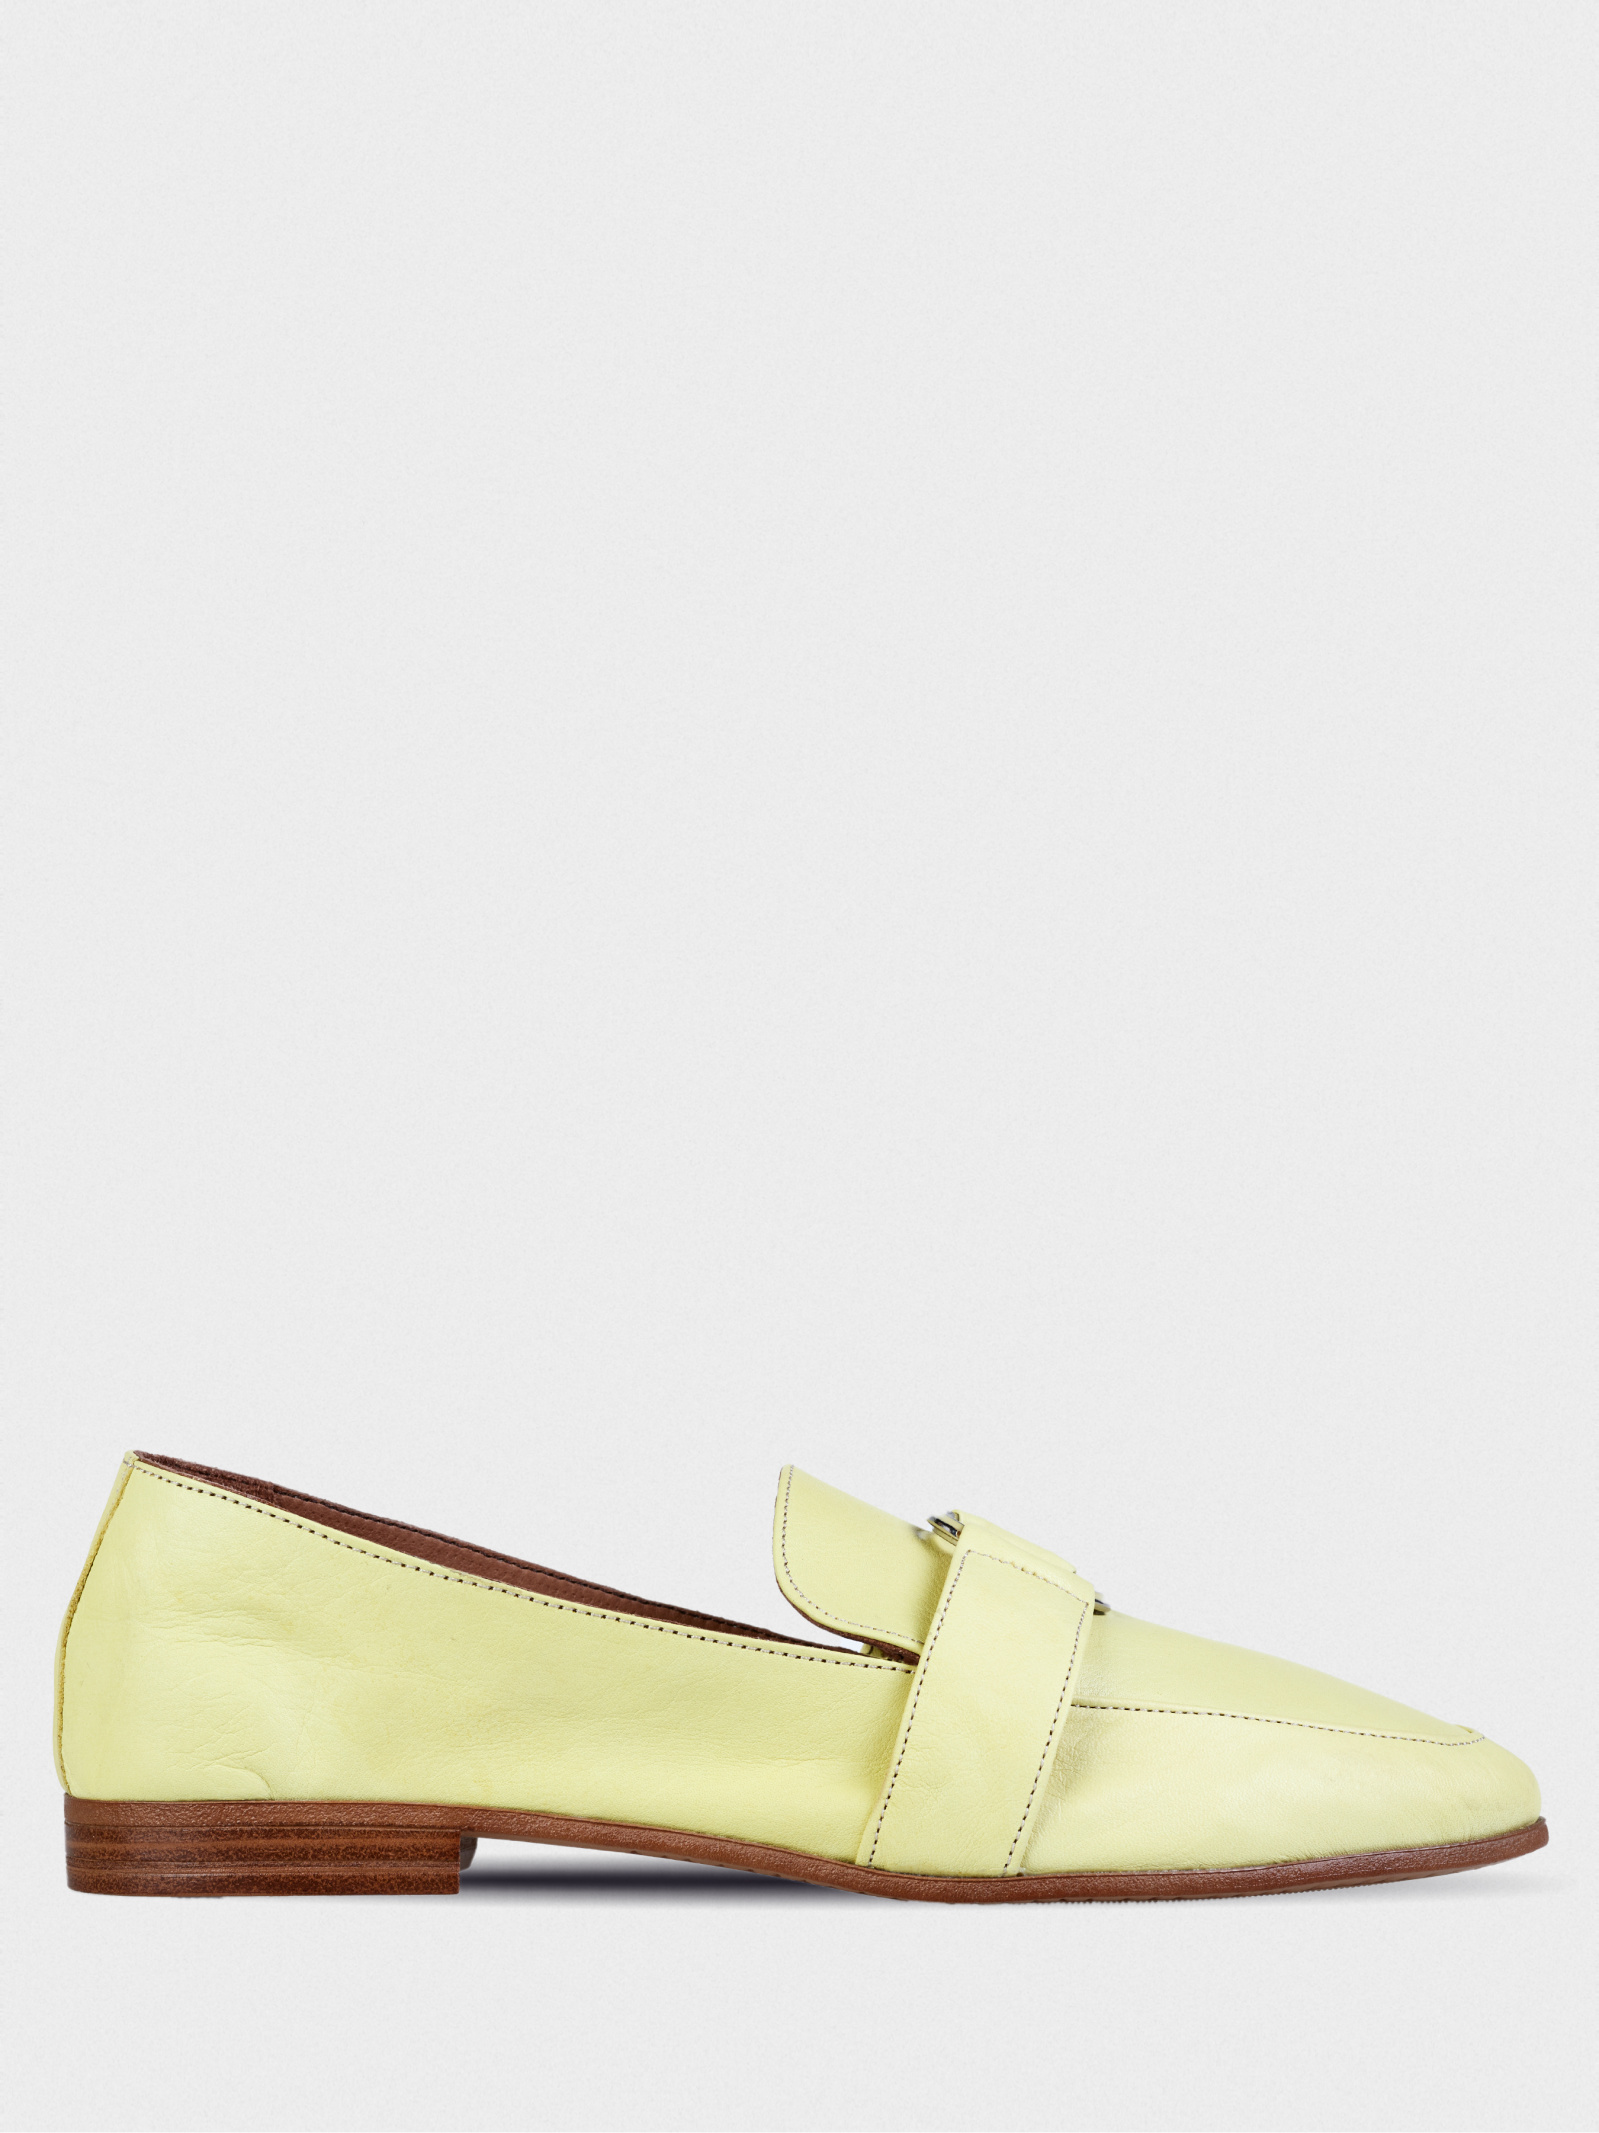 Туфлі  для жінок INUOVO 483003 Daisy продаж, 2017